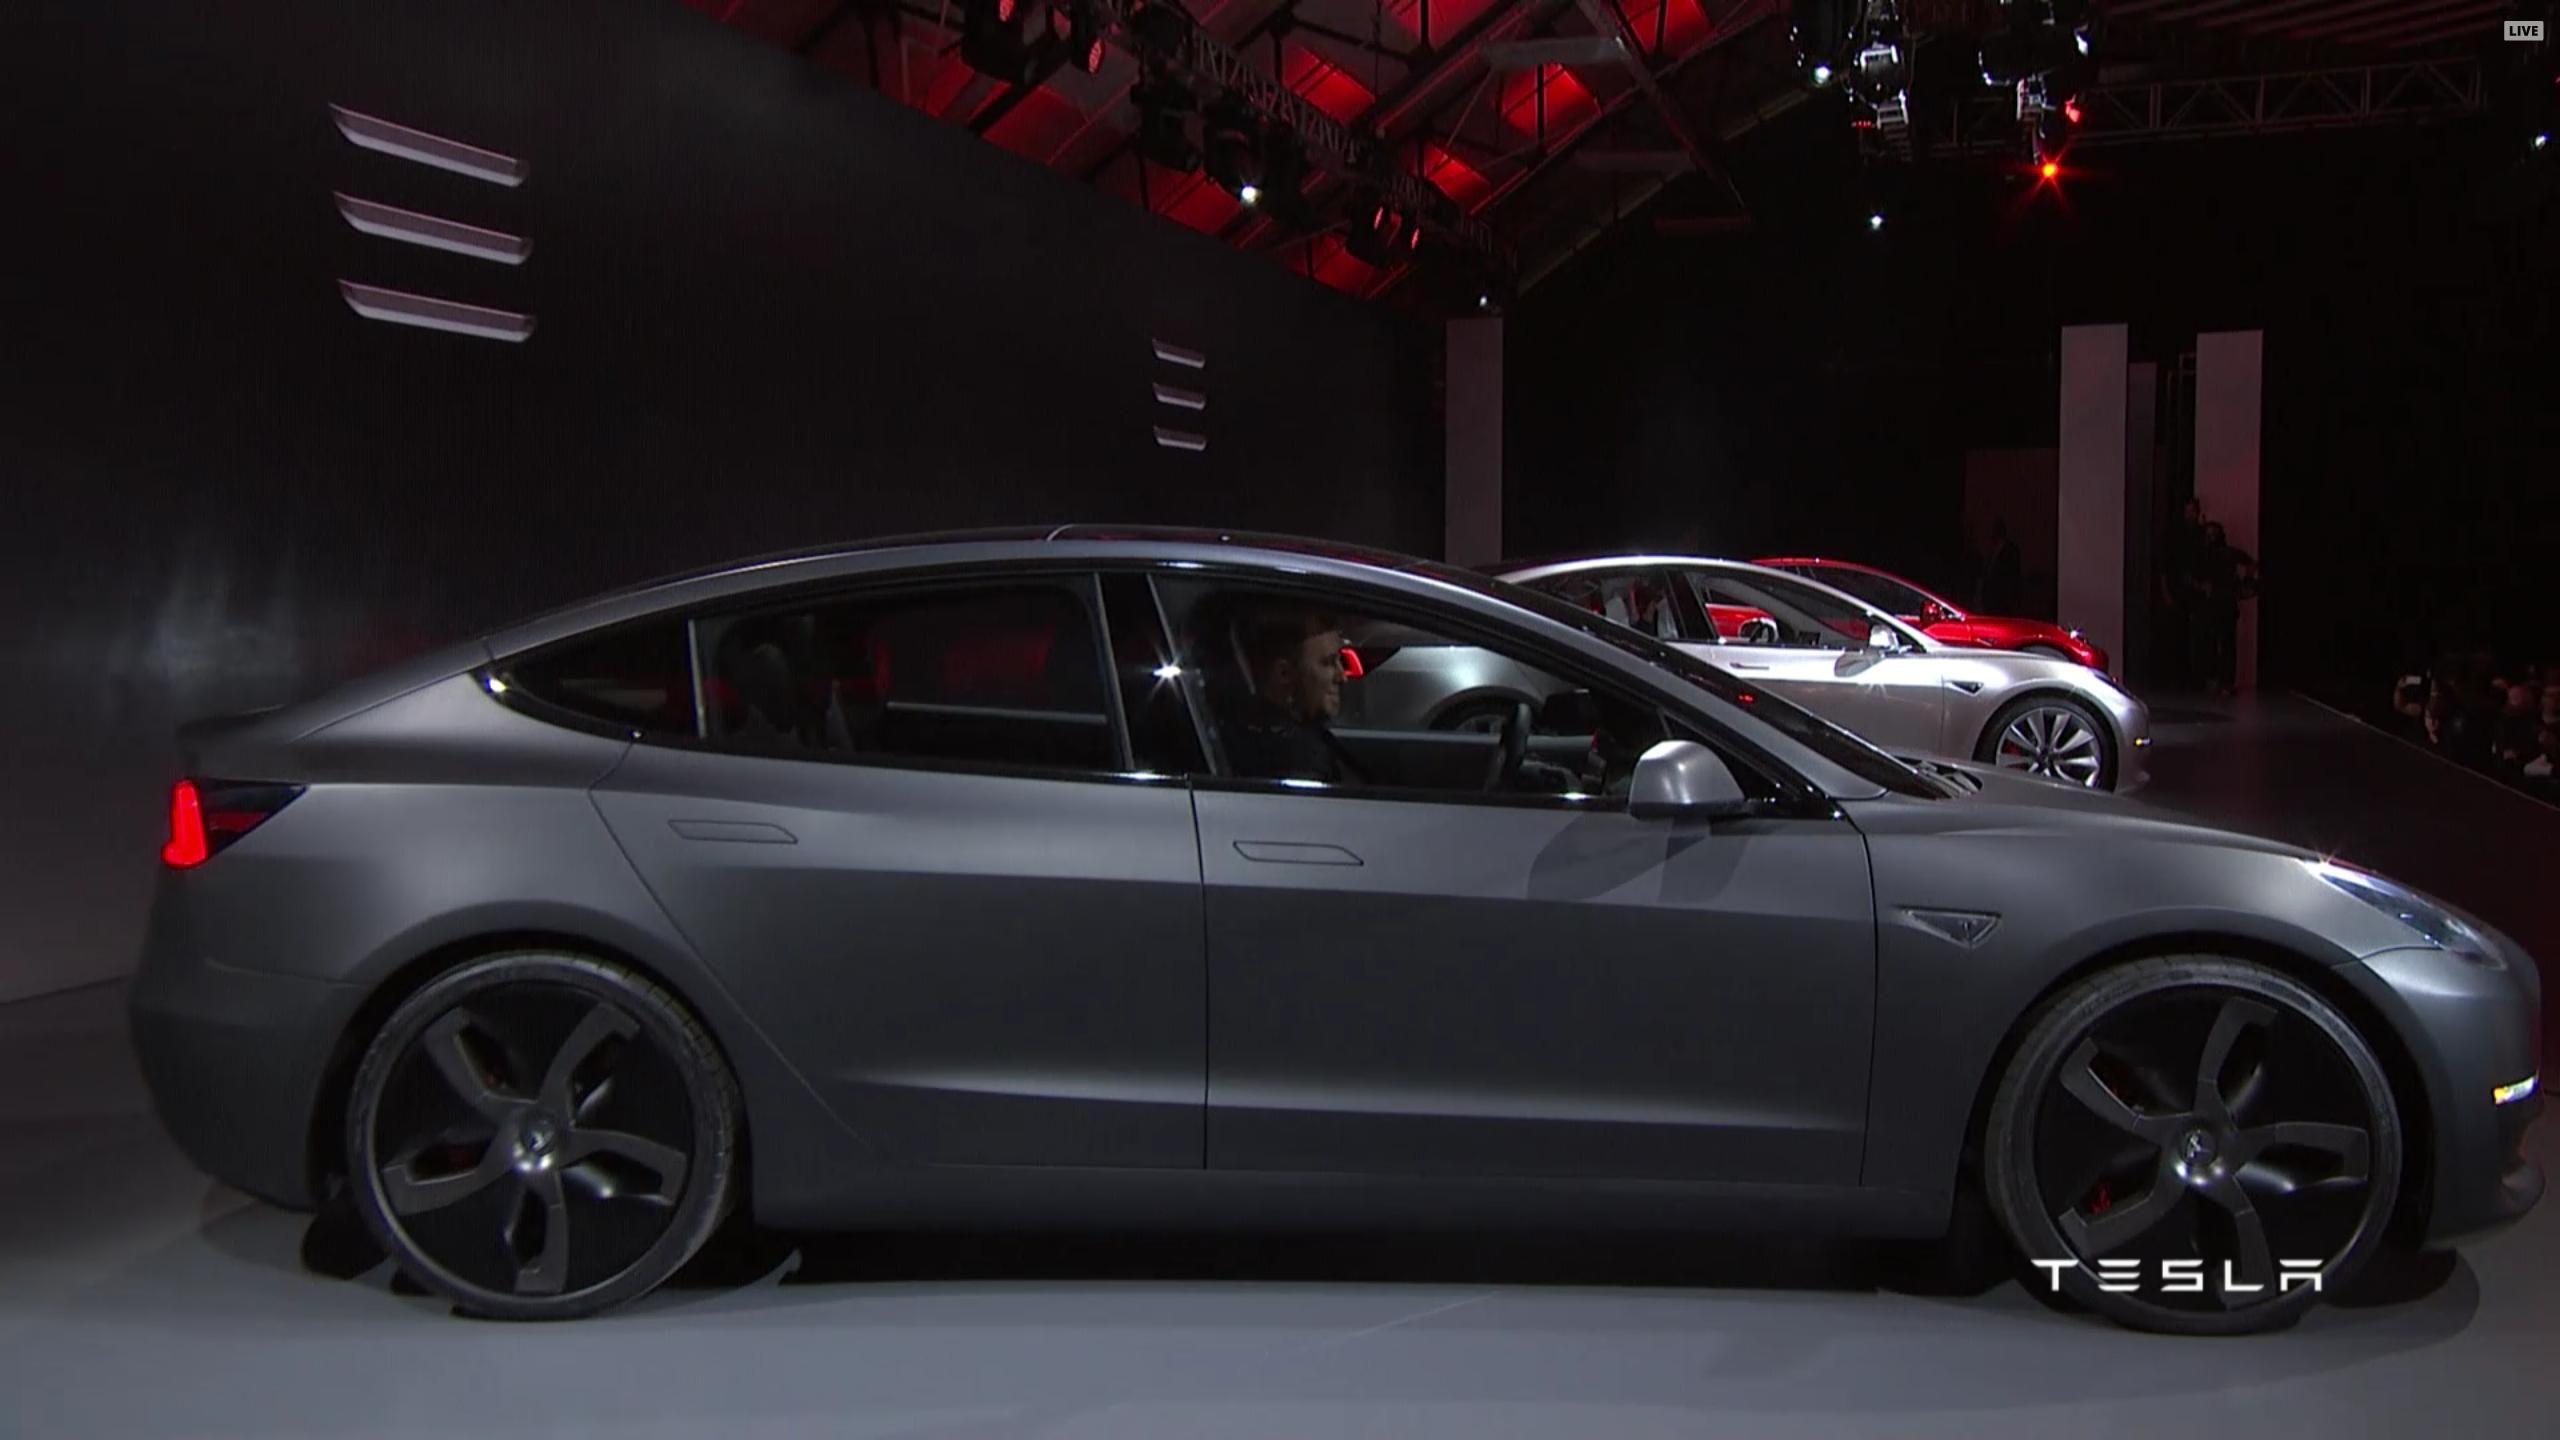 Tesla Model 3 Matte Black Tesla Model Tesla Model